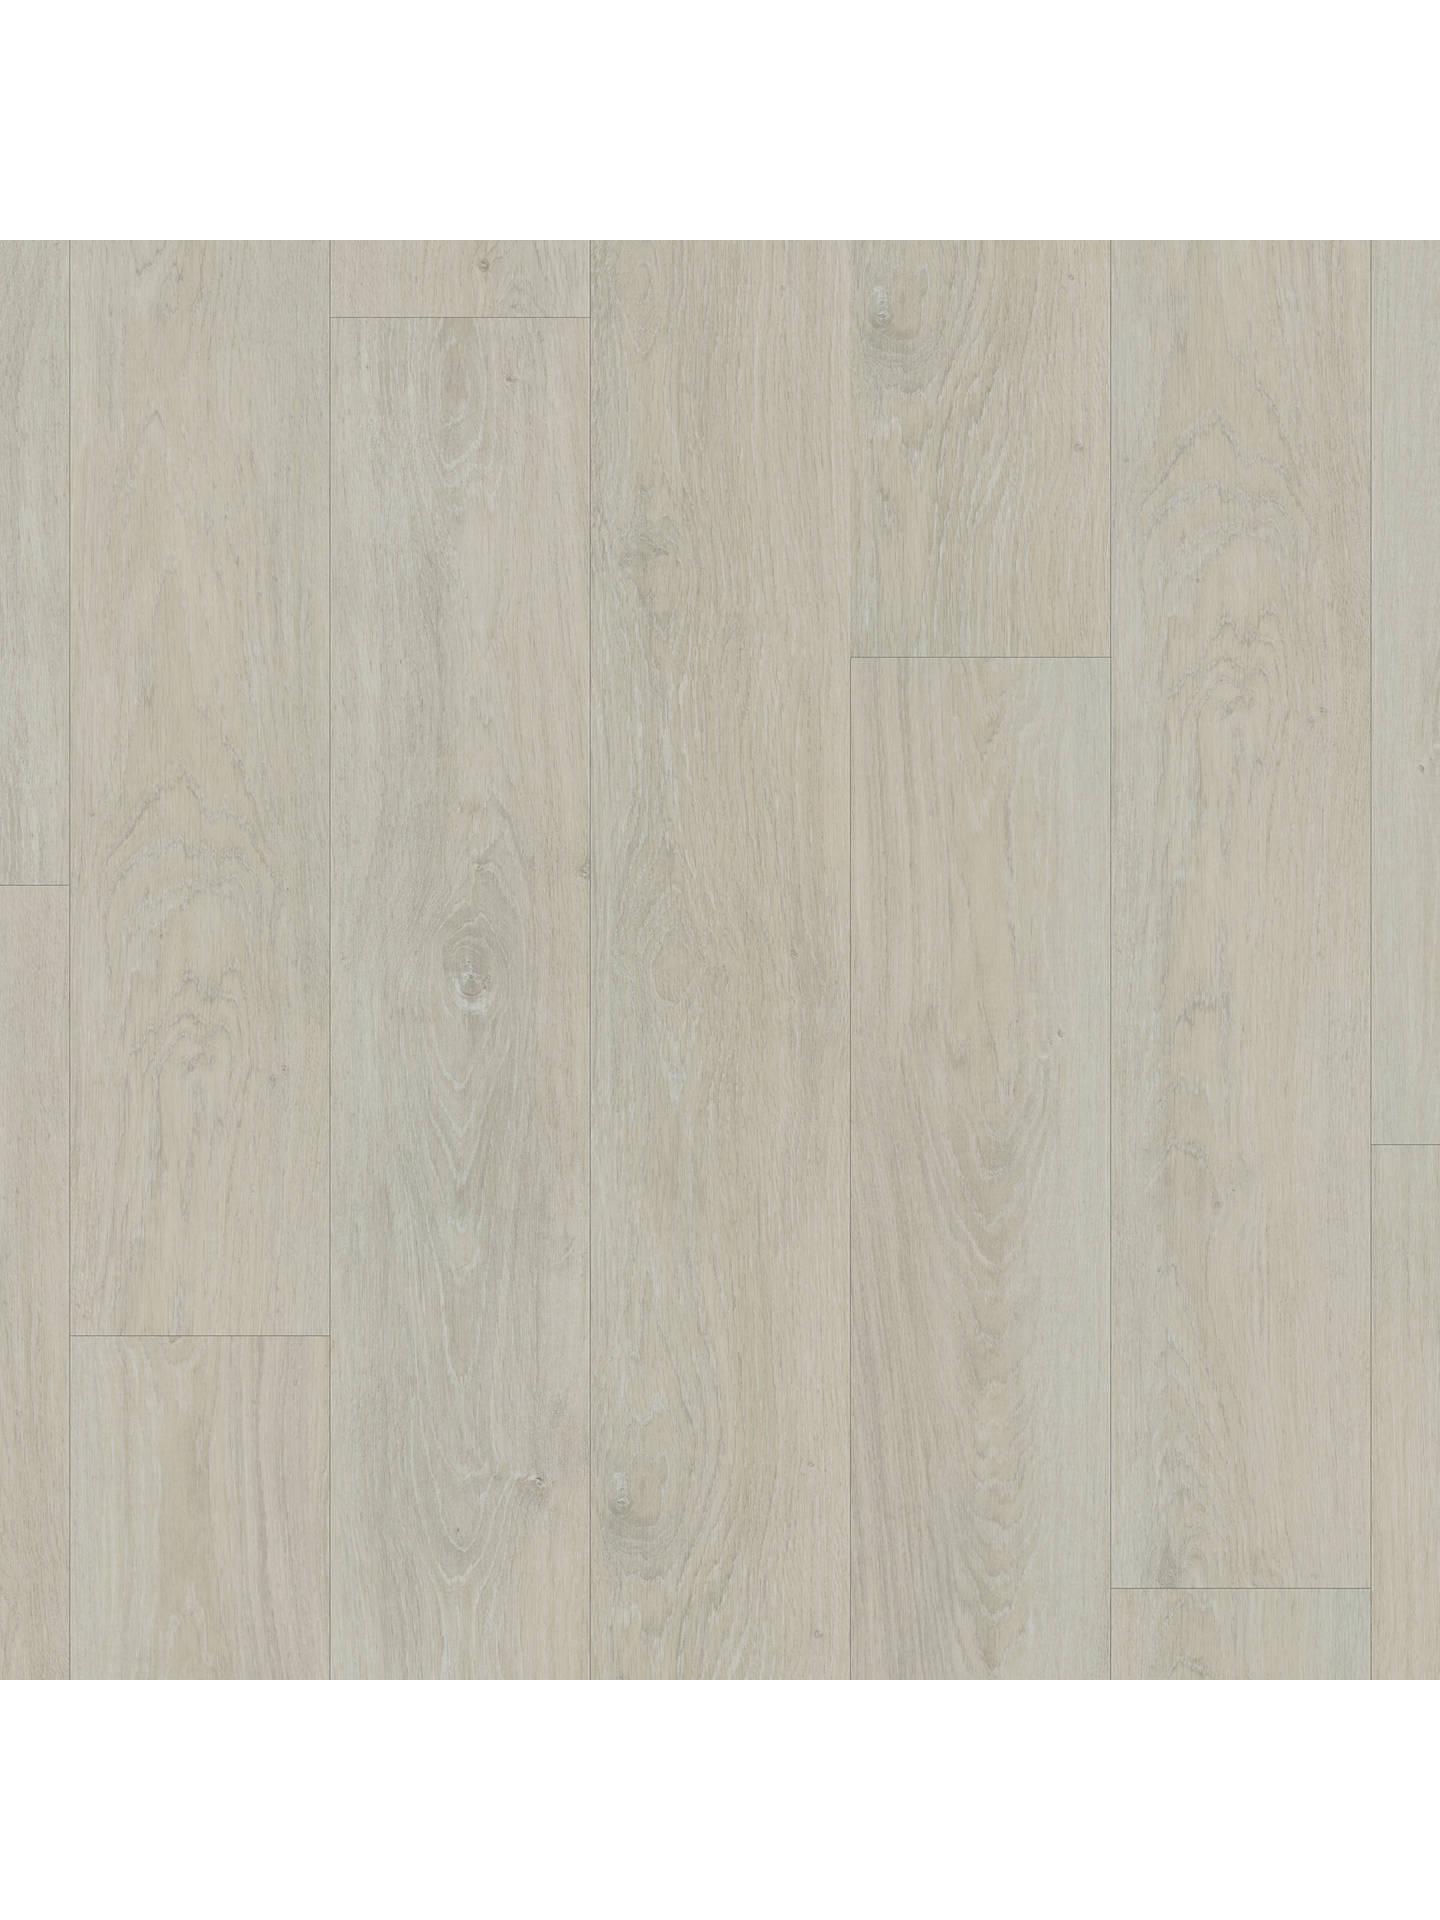 Kardean Palio Clic Luxury Vinyl Tile At John Lewis Partners